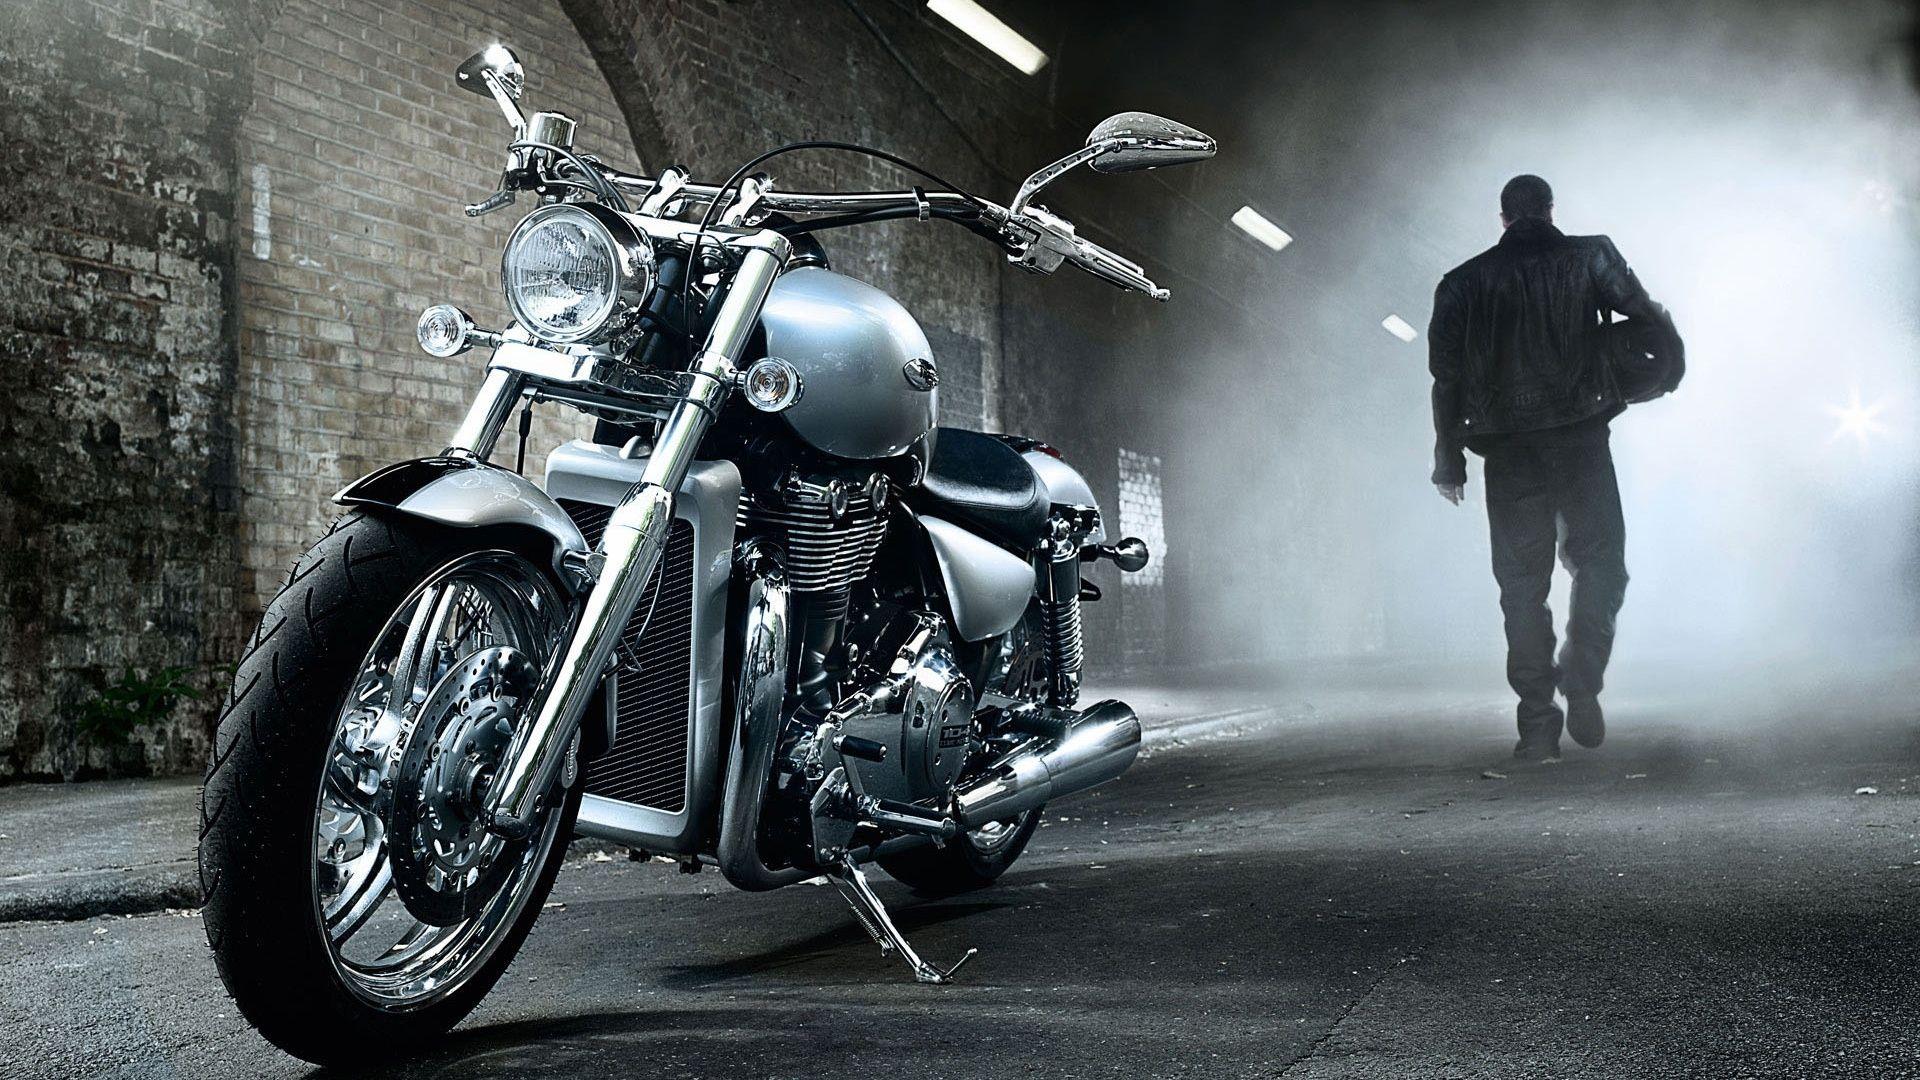 motorbike wallpapers hd - google keresés | trening anyag | pinterest